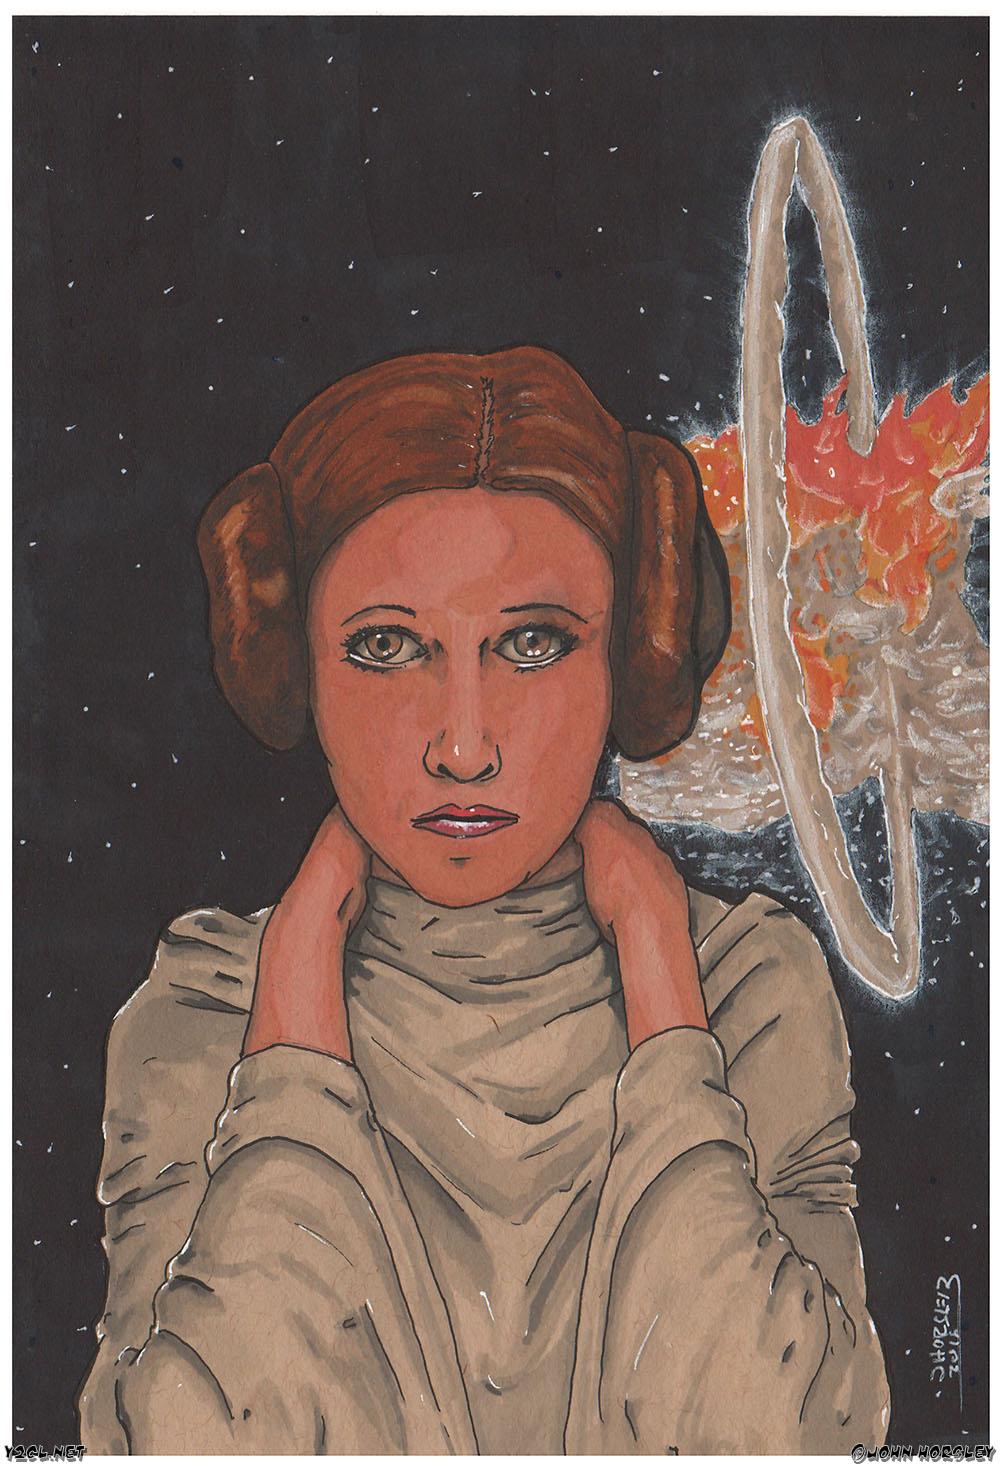 Princess Leia - Death Star Explosion copy